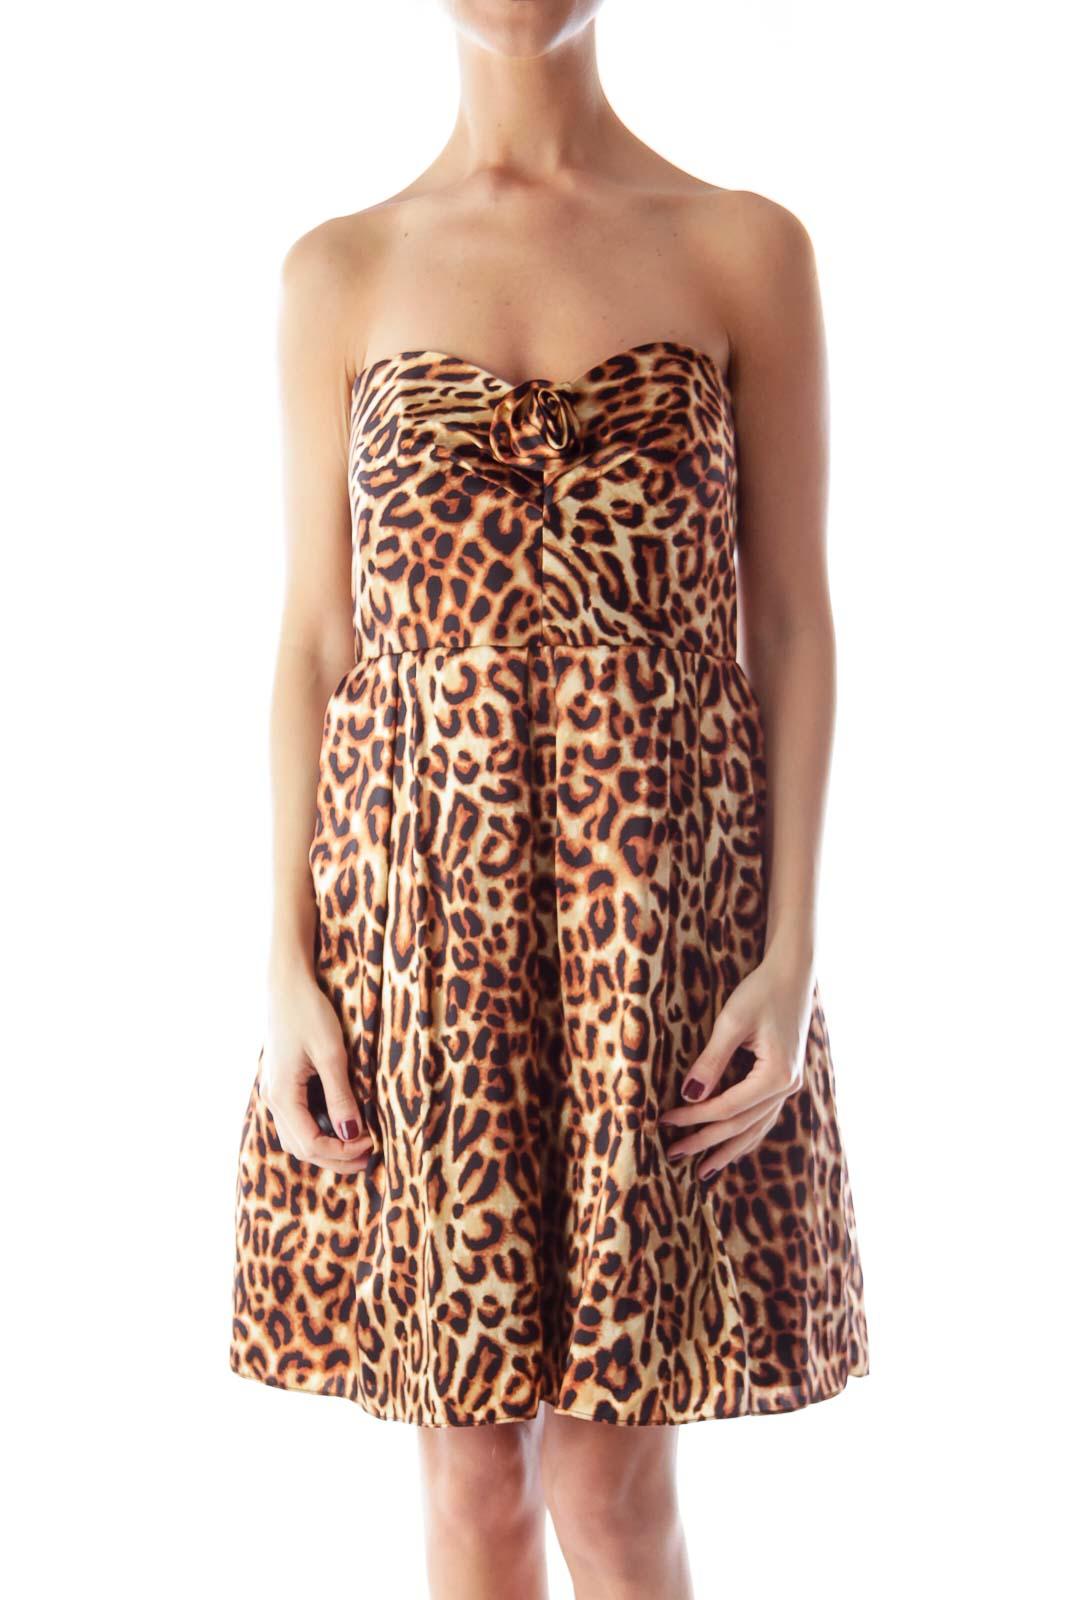 Cheetah Print Mini Dress Front